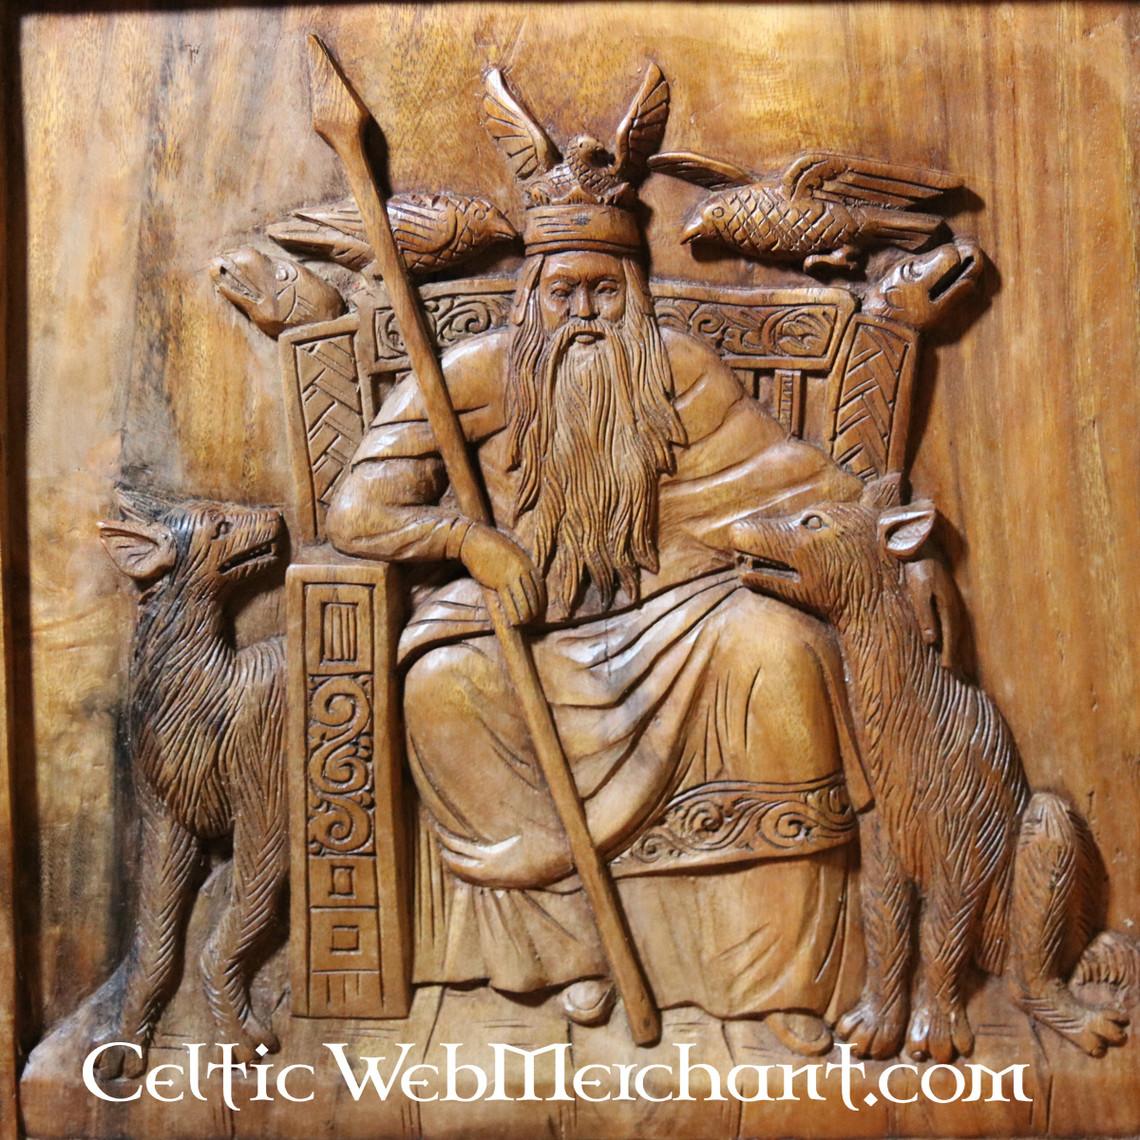 Pared de madera decoración de Odin